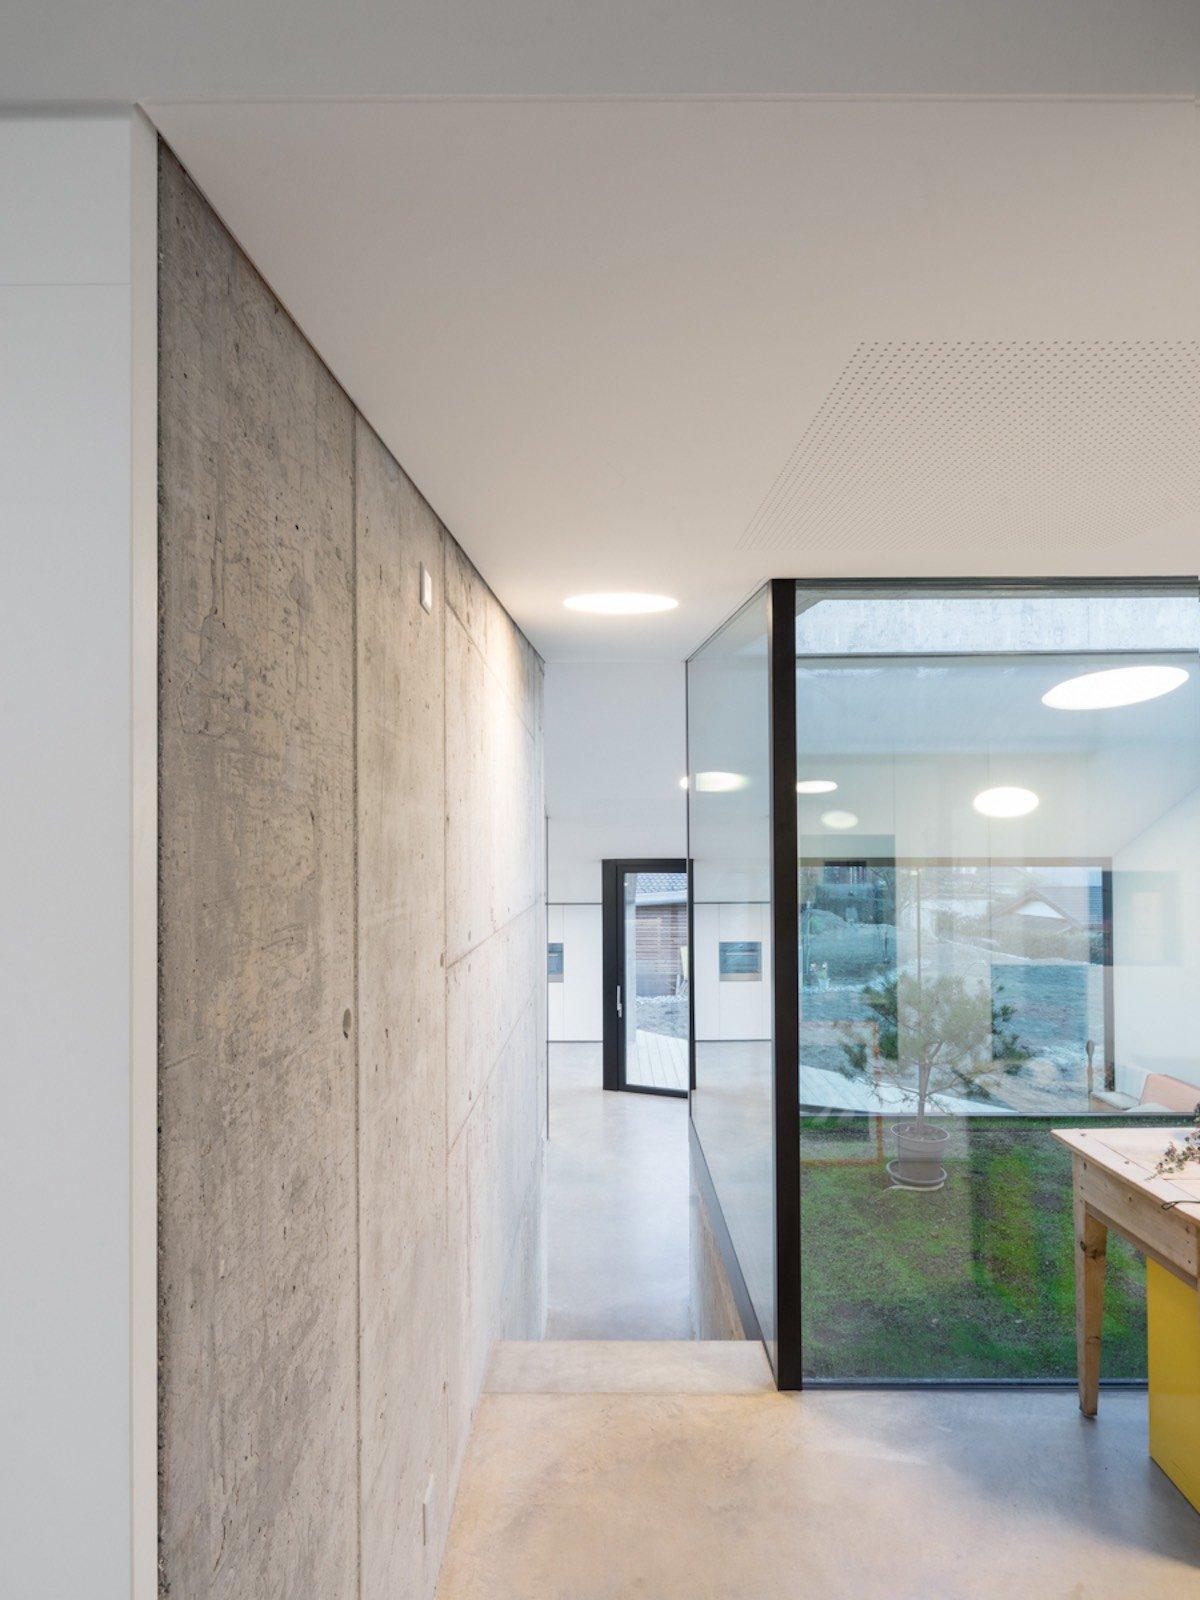 Architecture_House_Saviese_Anako_Architecture_08